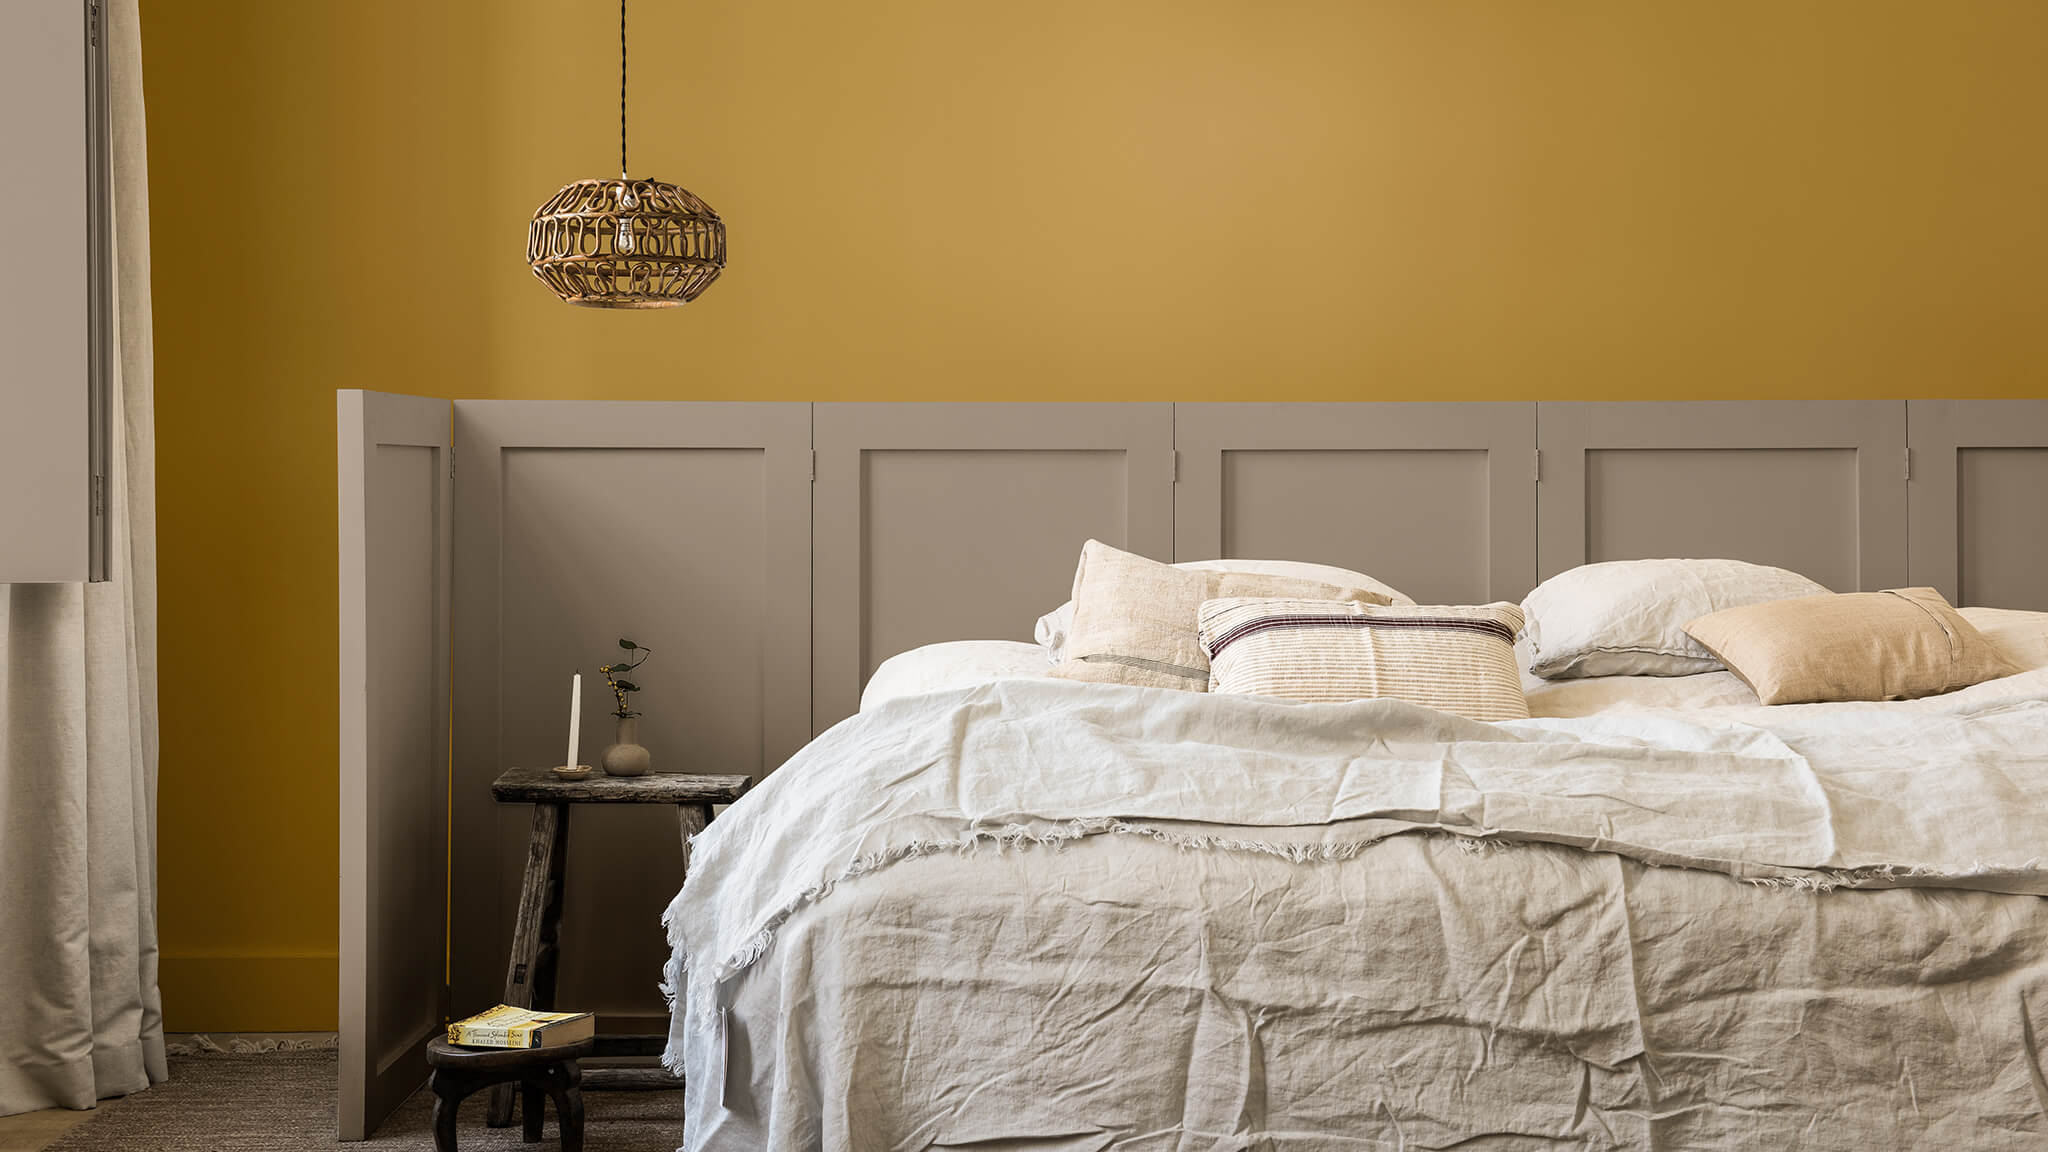 Slaapkamermuur geverfd in goudgeel en Brave Ground™, met lambrisering achter het bed